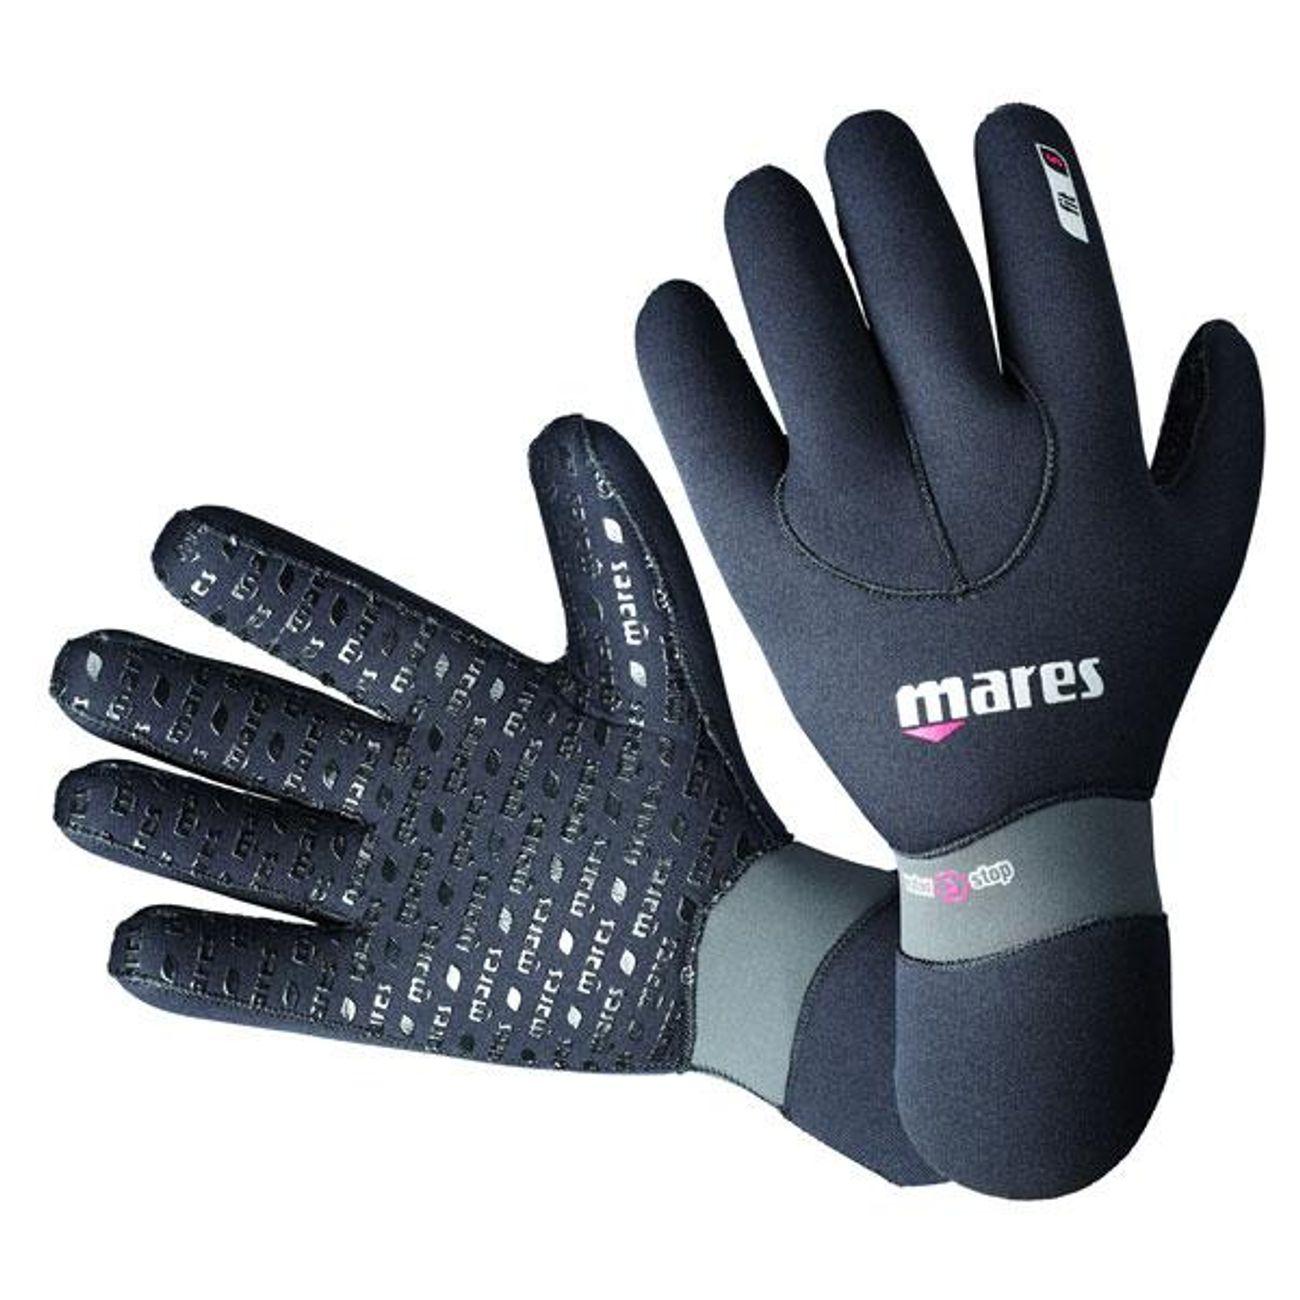 Adulte Gloves Mm 6 Flexa Plongée 5 Mares Fit Xwo8n0pk dCBorxe